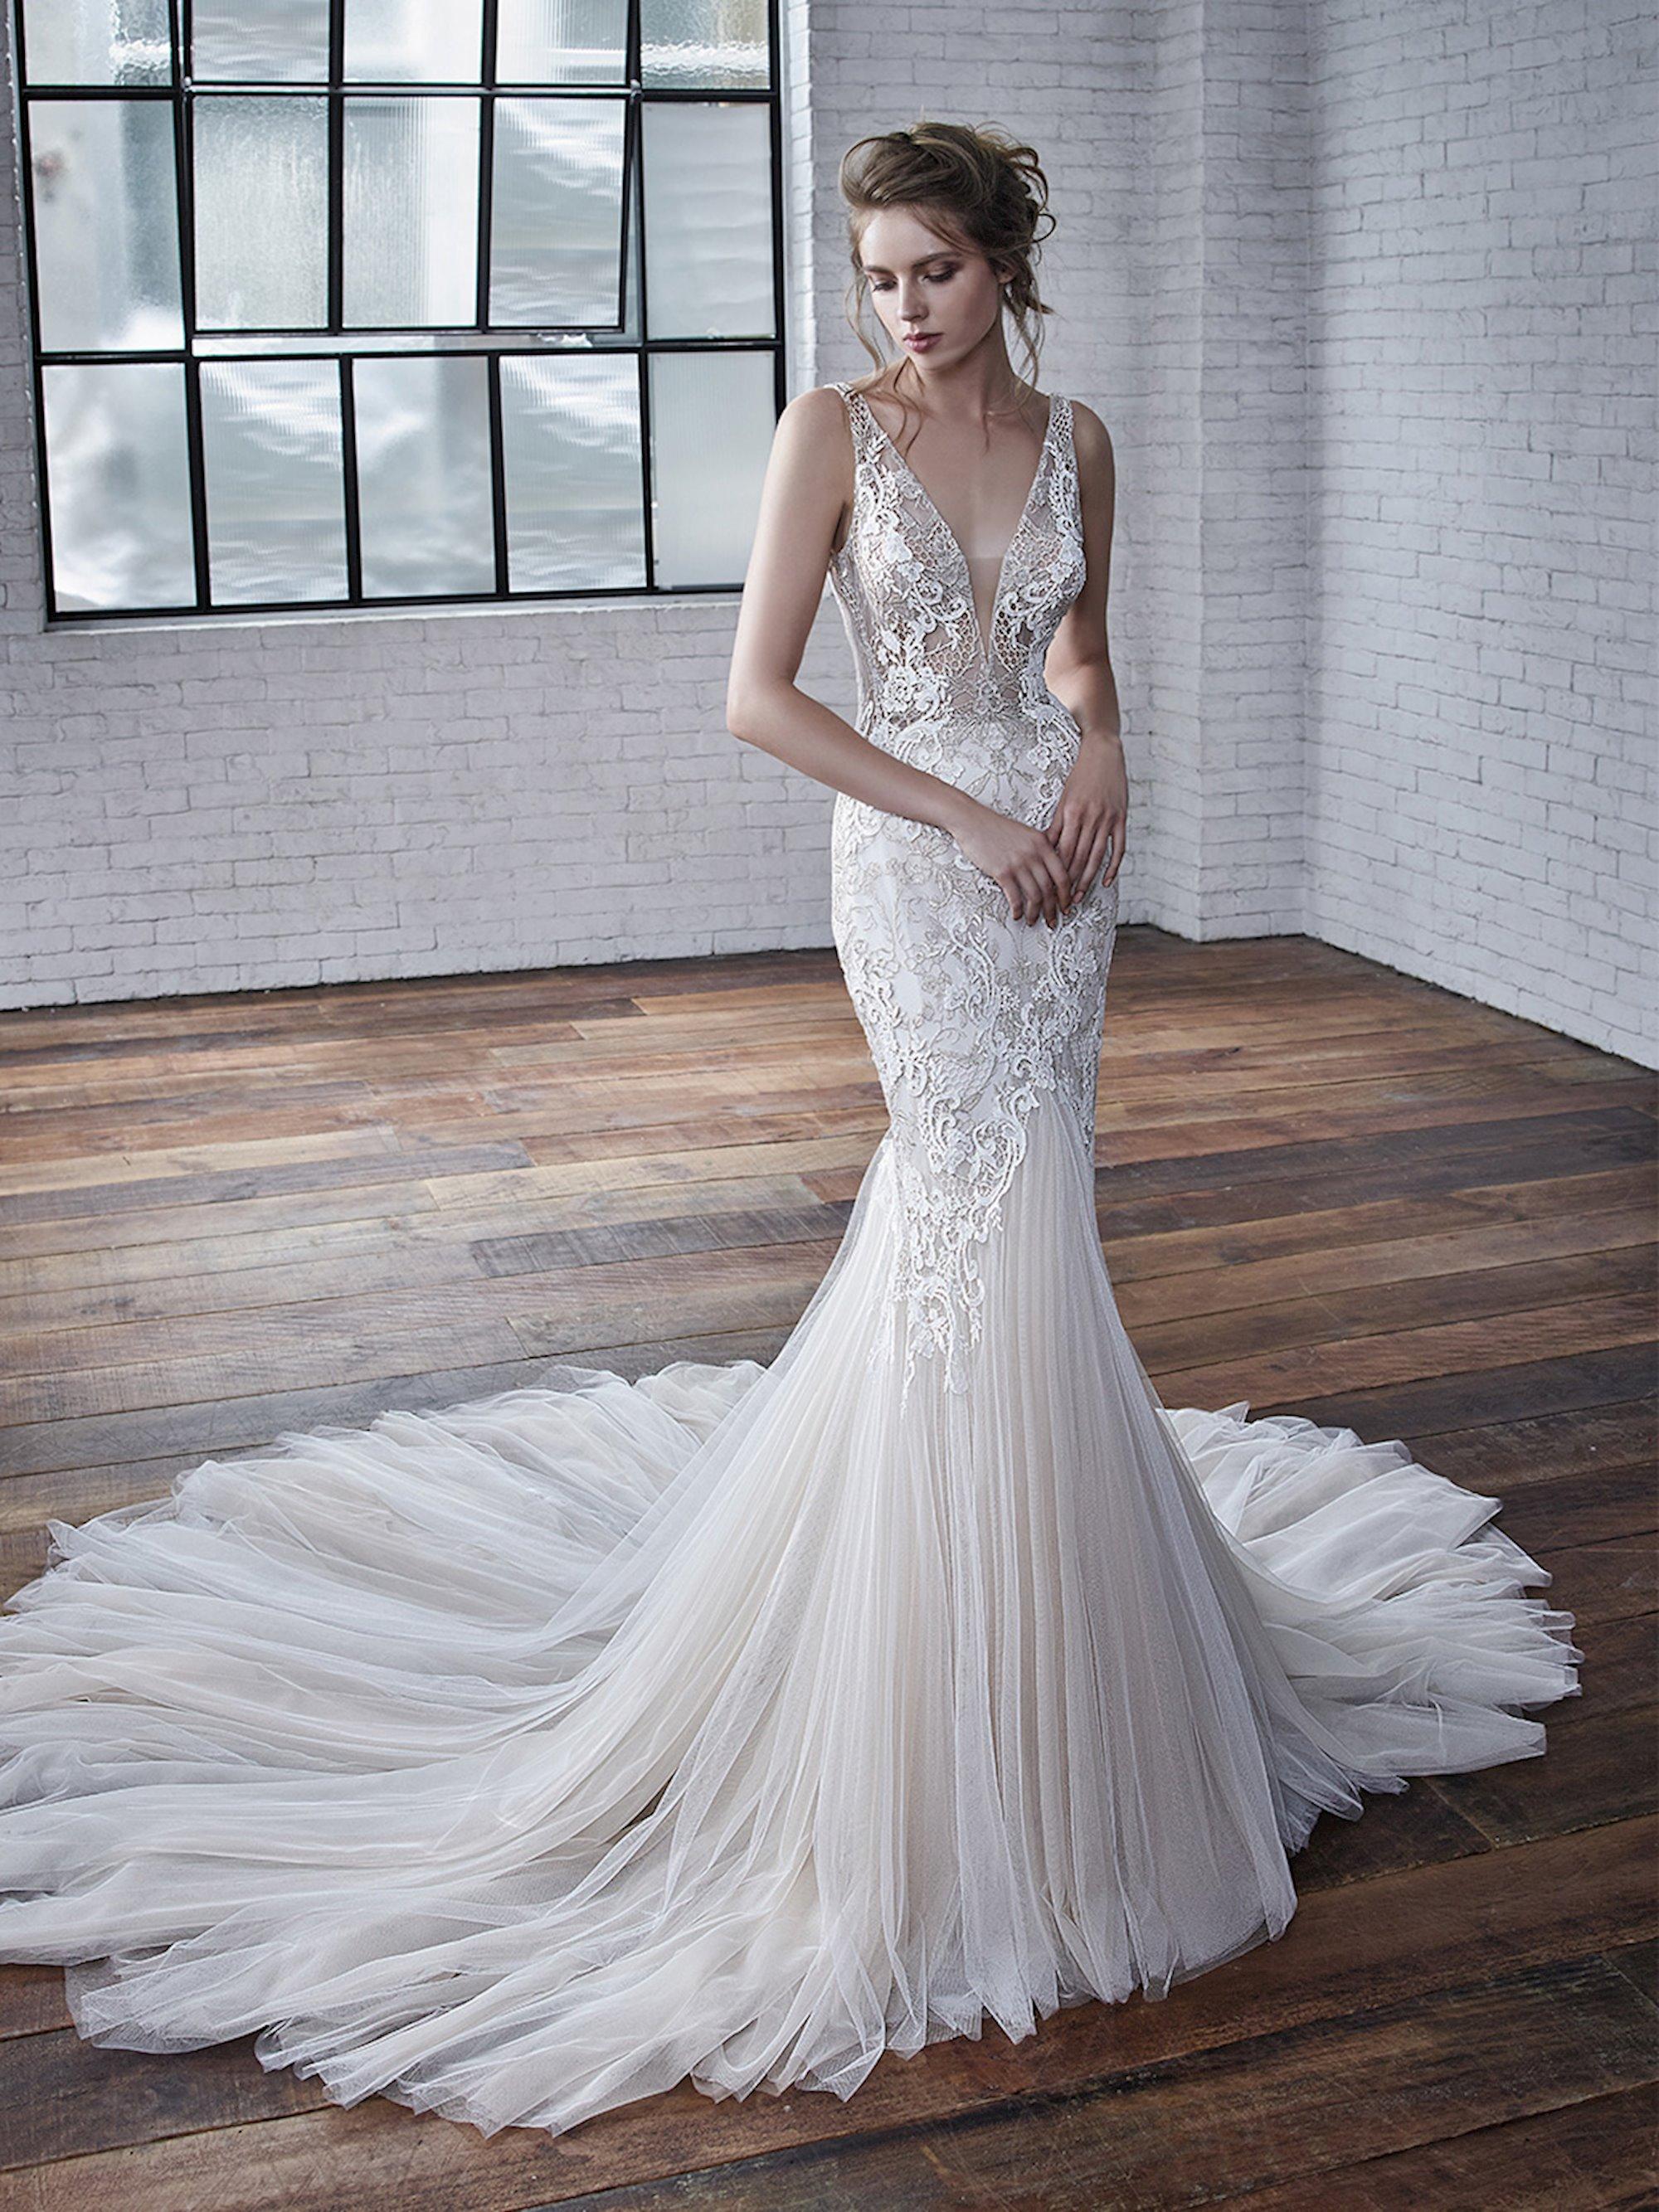 Badgley Mischka Coco Mariella Creations,Short Wedding Dresses For Beach Ceremony